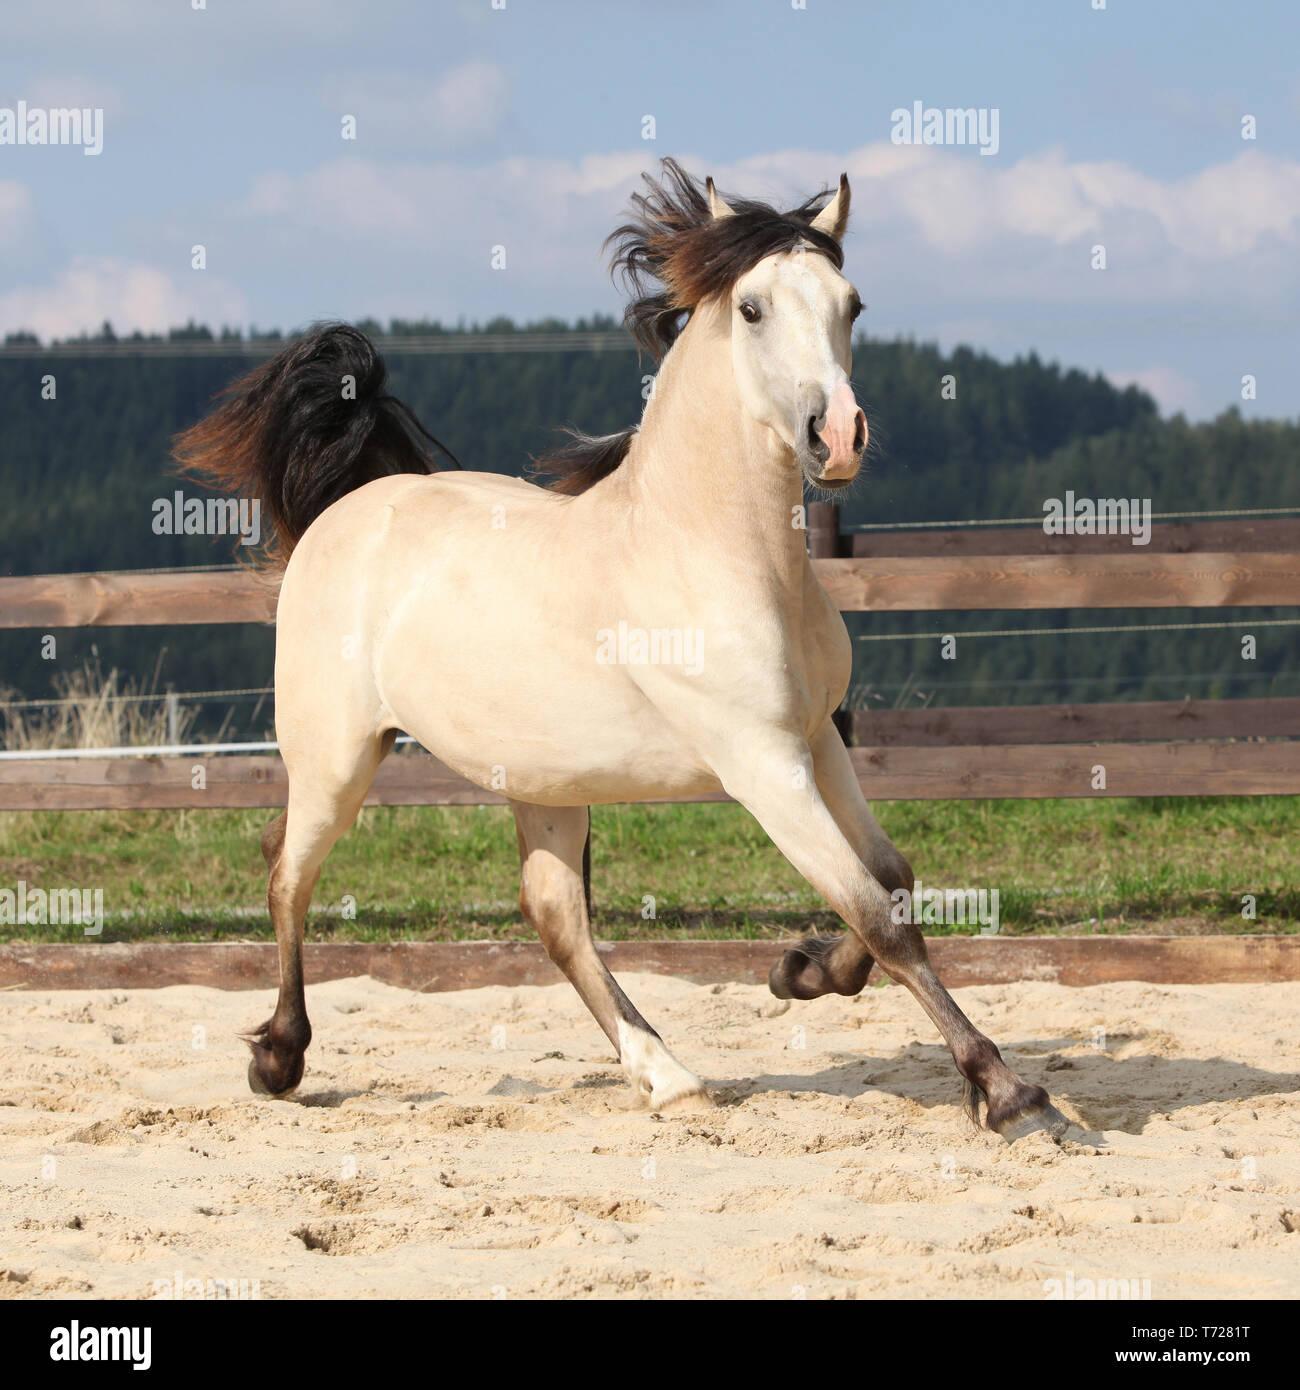 Beautiful Palomino Horse Running On The Sand Stock Photo Alamy